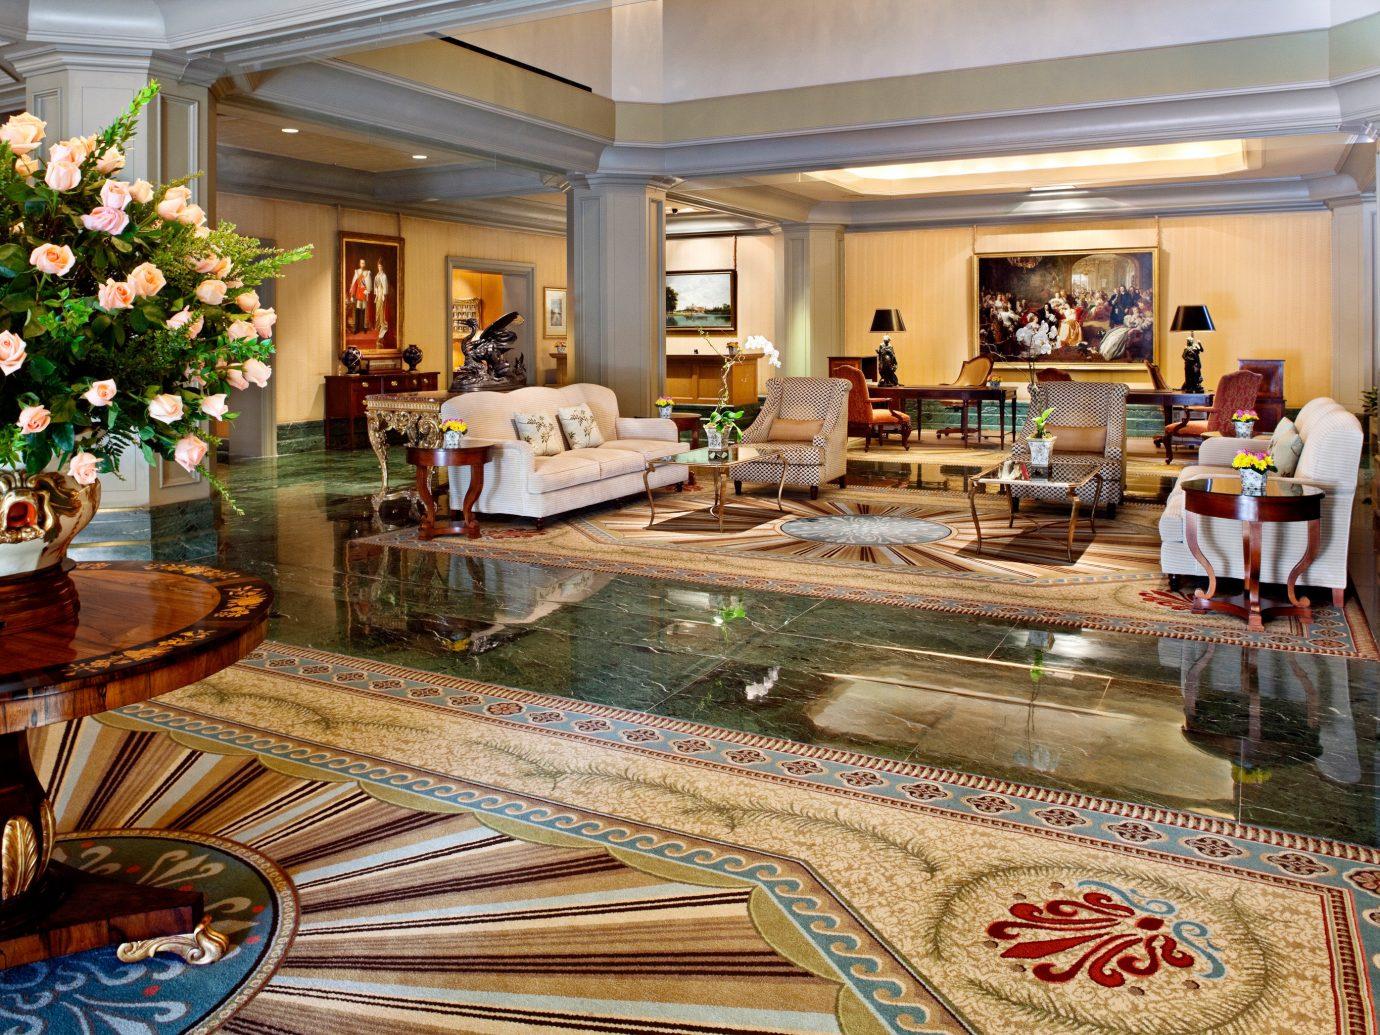 Elegant Hotels Lobby indoor property room estate meal home interior design Resort living room mansion real estate flooring palace decorated